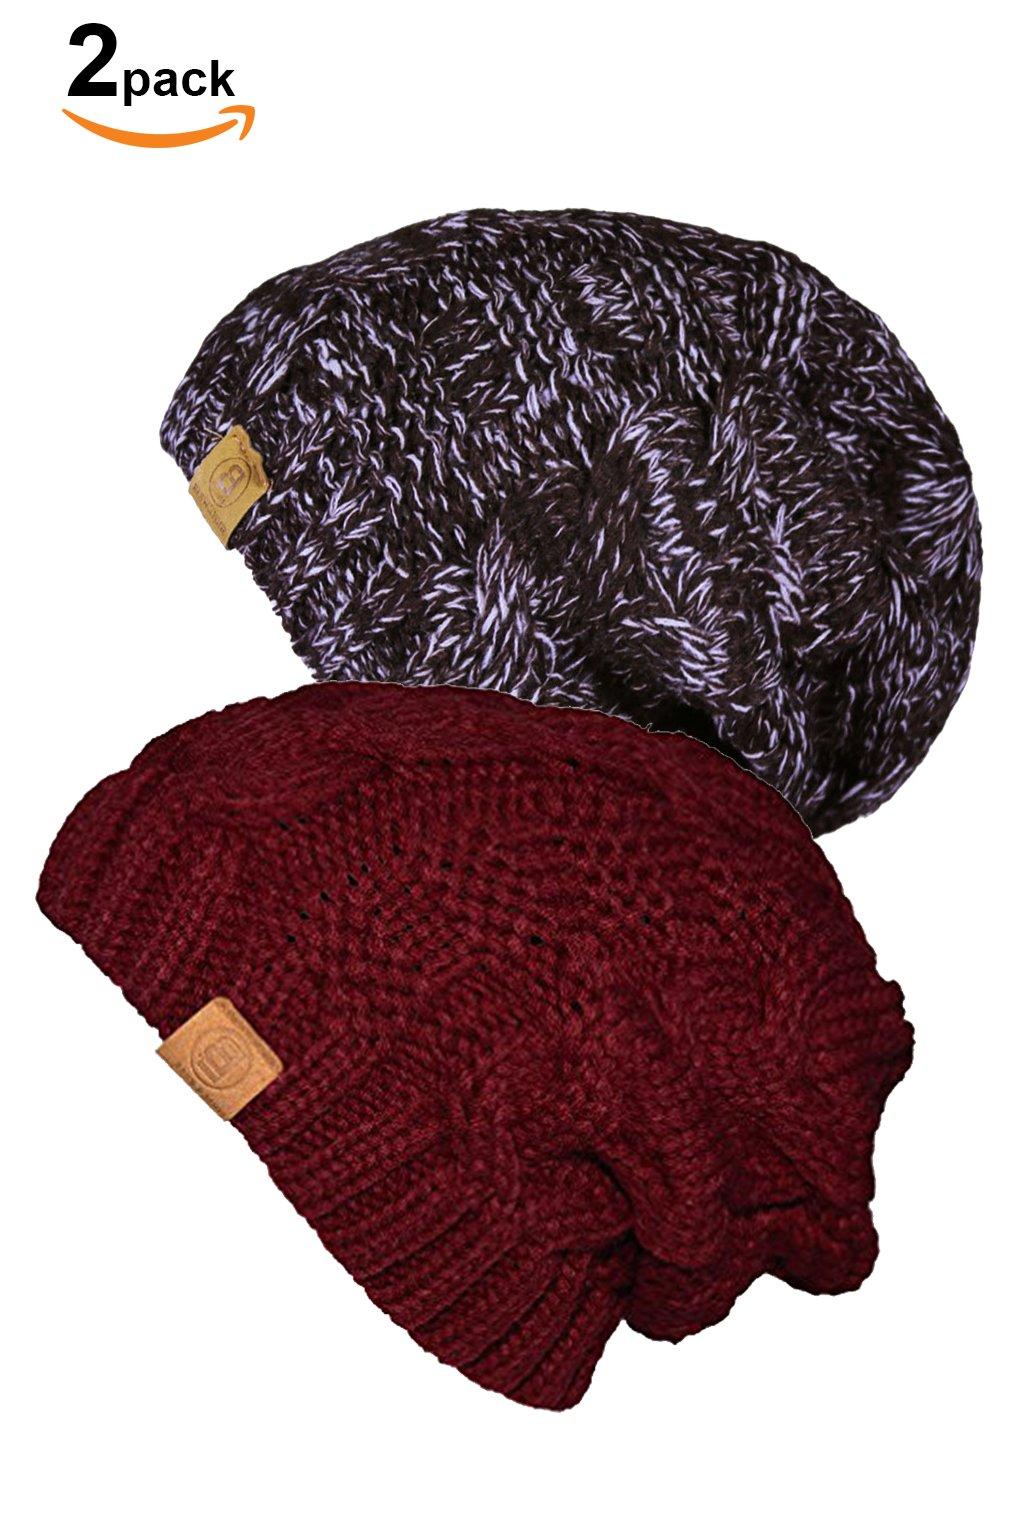 011c8b118cc BASICO Unisex Warm Chunky Soft Stretch Cable Knit Beanie Cap Hat ...